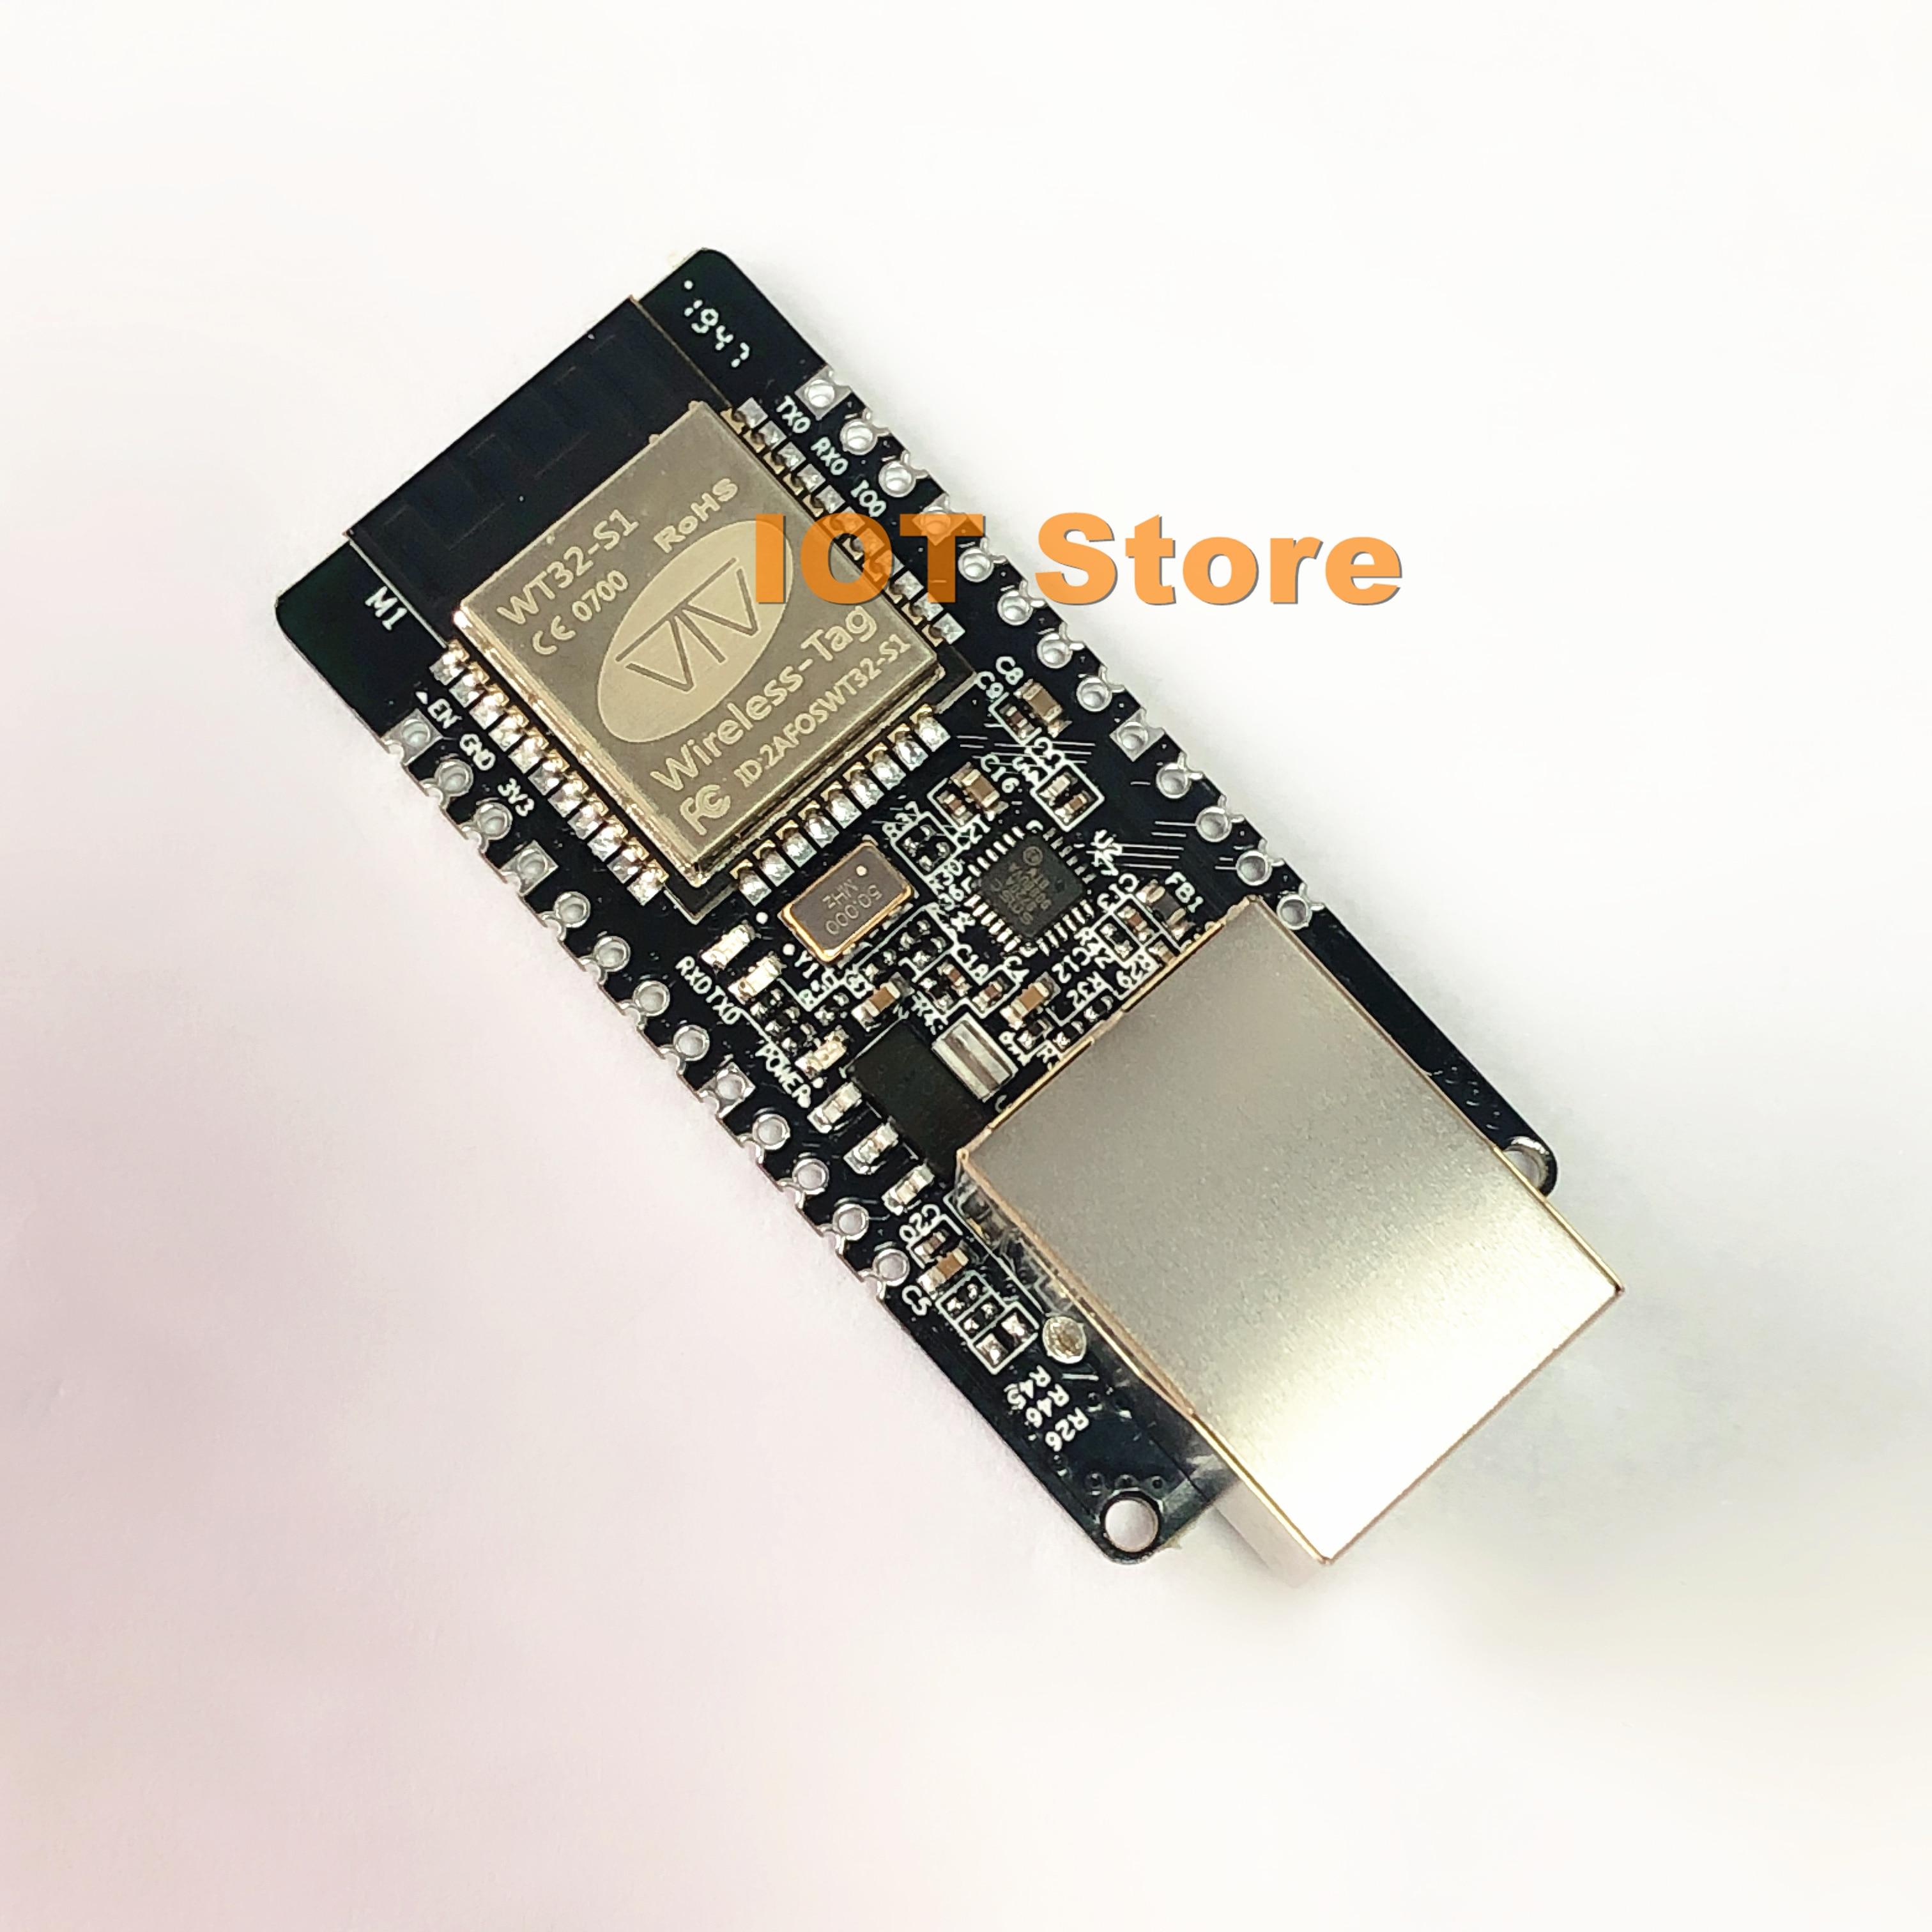 WT32-ETH01 WIFI+Bluetooth RJ45 Gateway Two-in-one Embedded Ethernet Module Serial Port Transparent Transmission